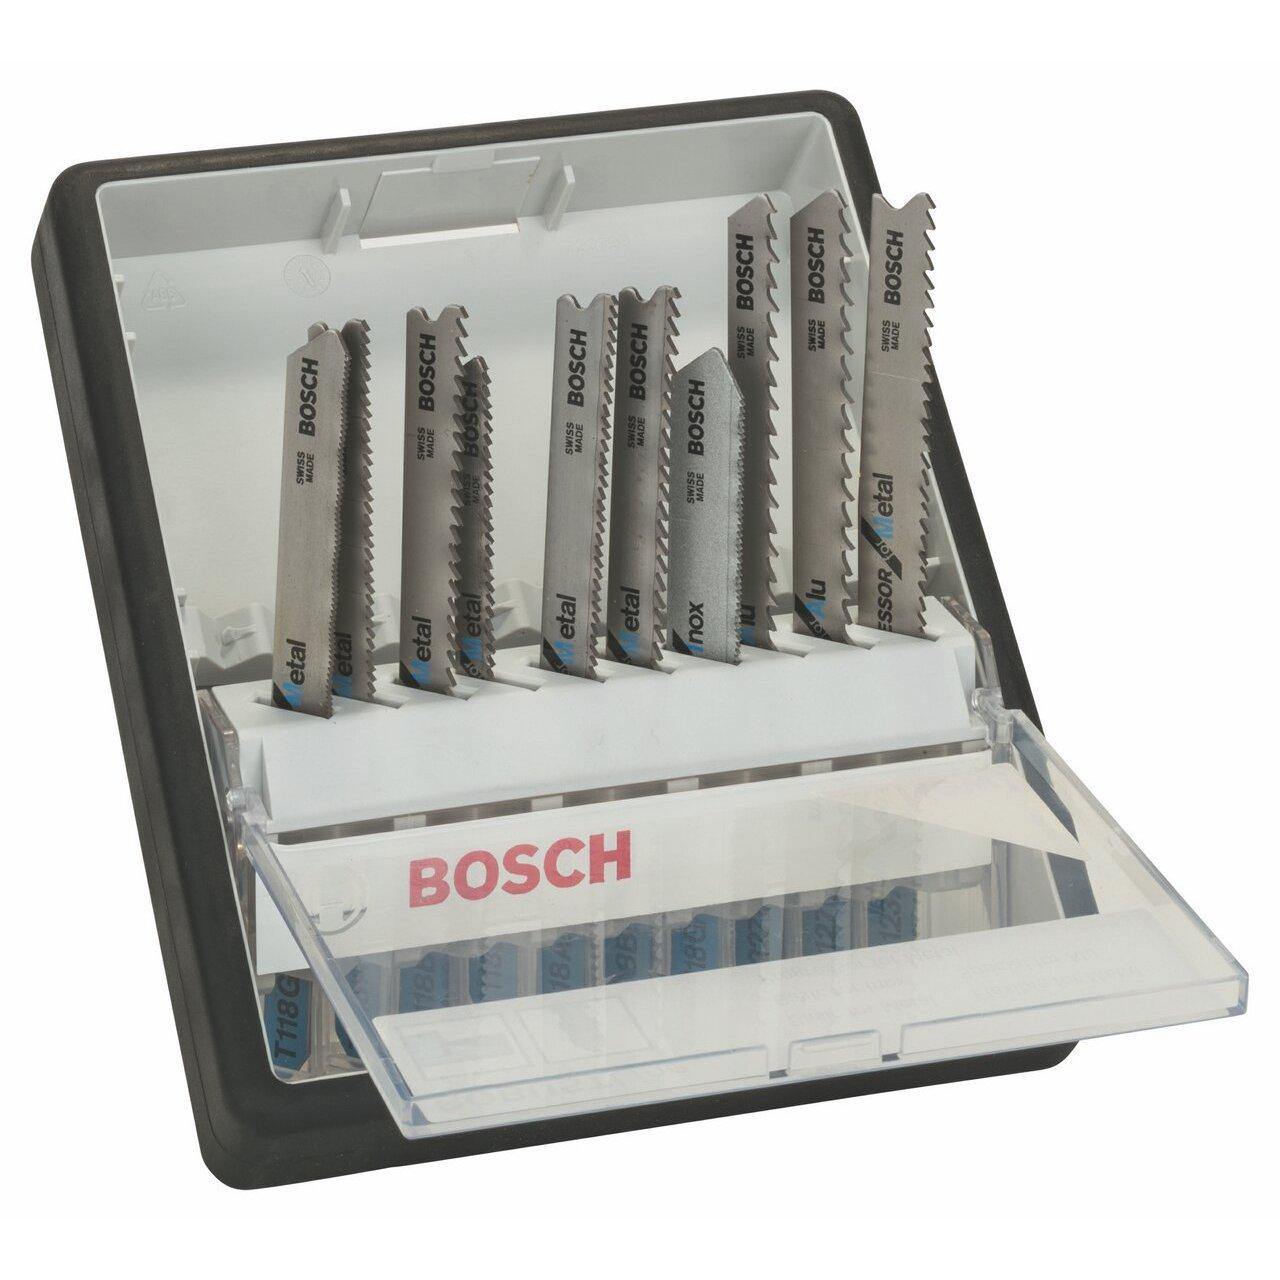 Bosch Robustline 10 pc wood jigsaw blade set 2607010540